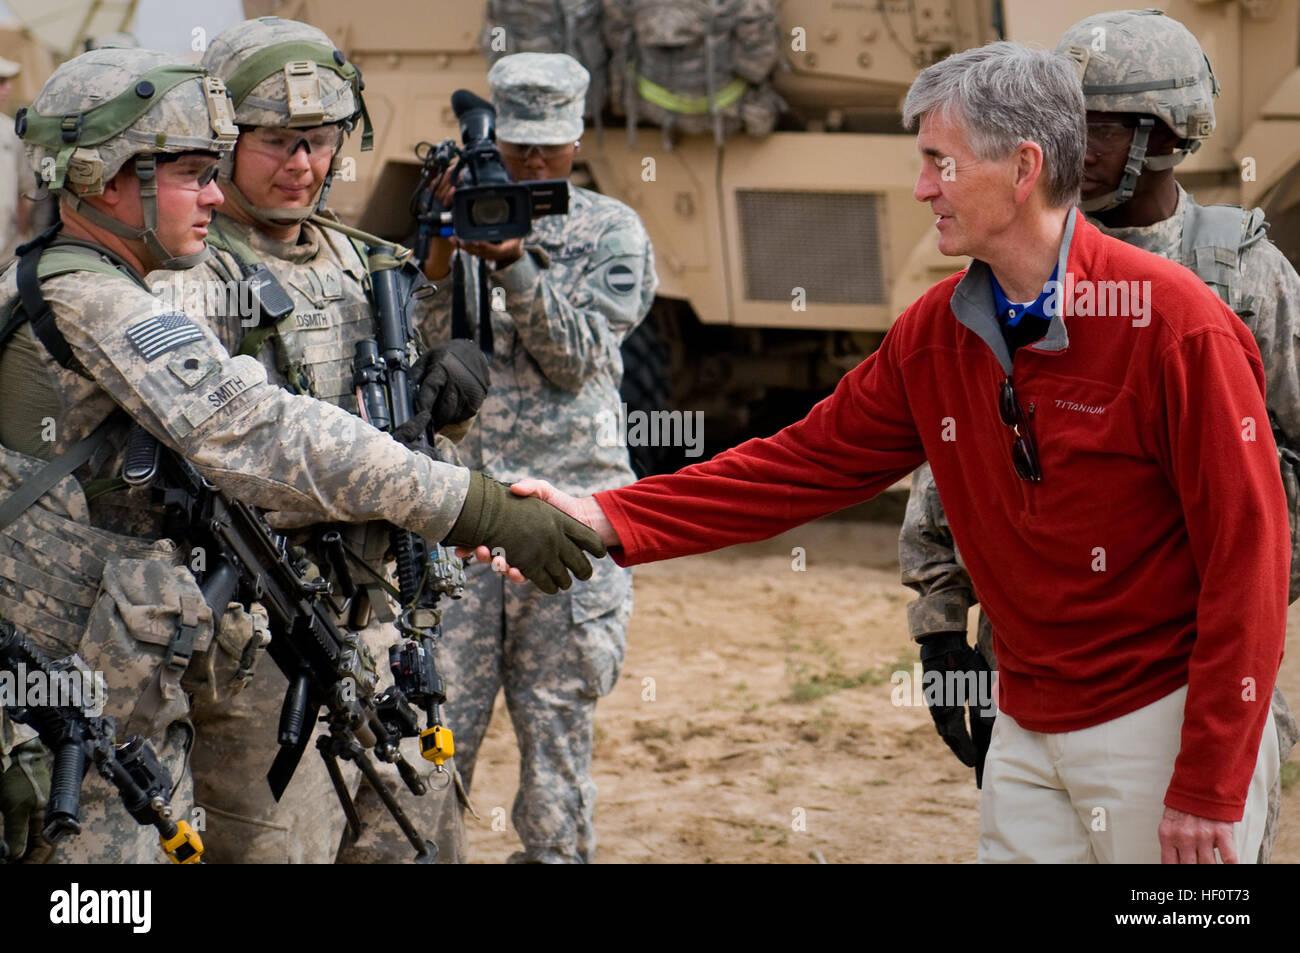 Secretary John McHugh, the 21st secretary of the Army, shakes the hand of a 2nd Heavy Brigade Combat Team, 1st Armored Stock Photo